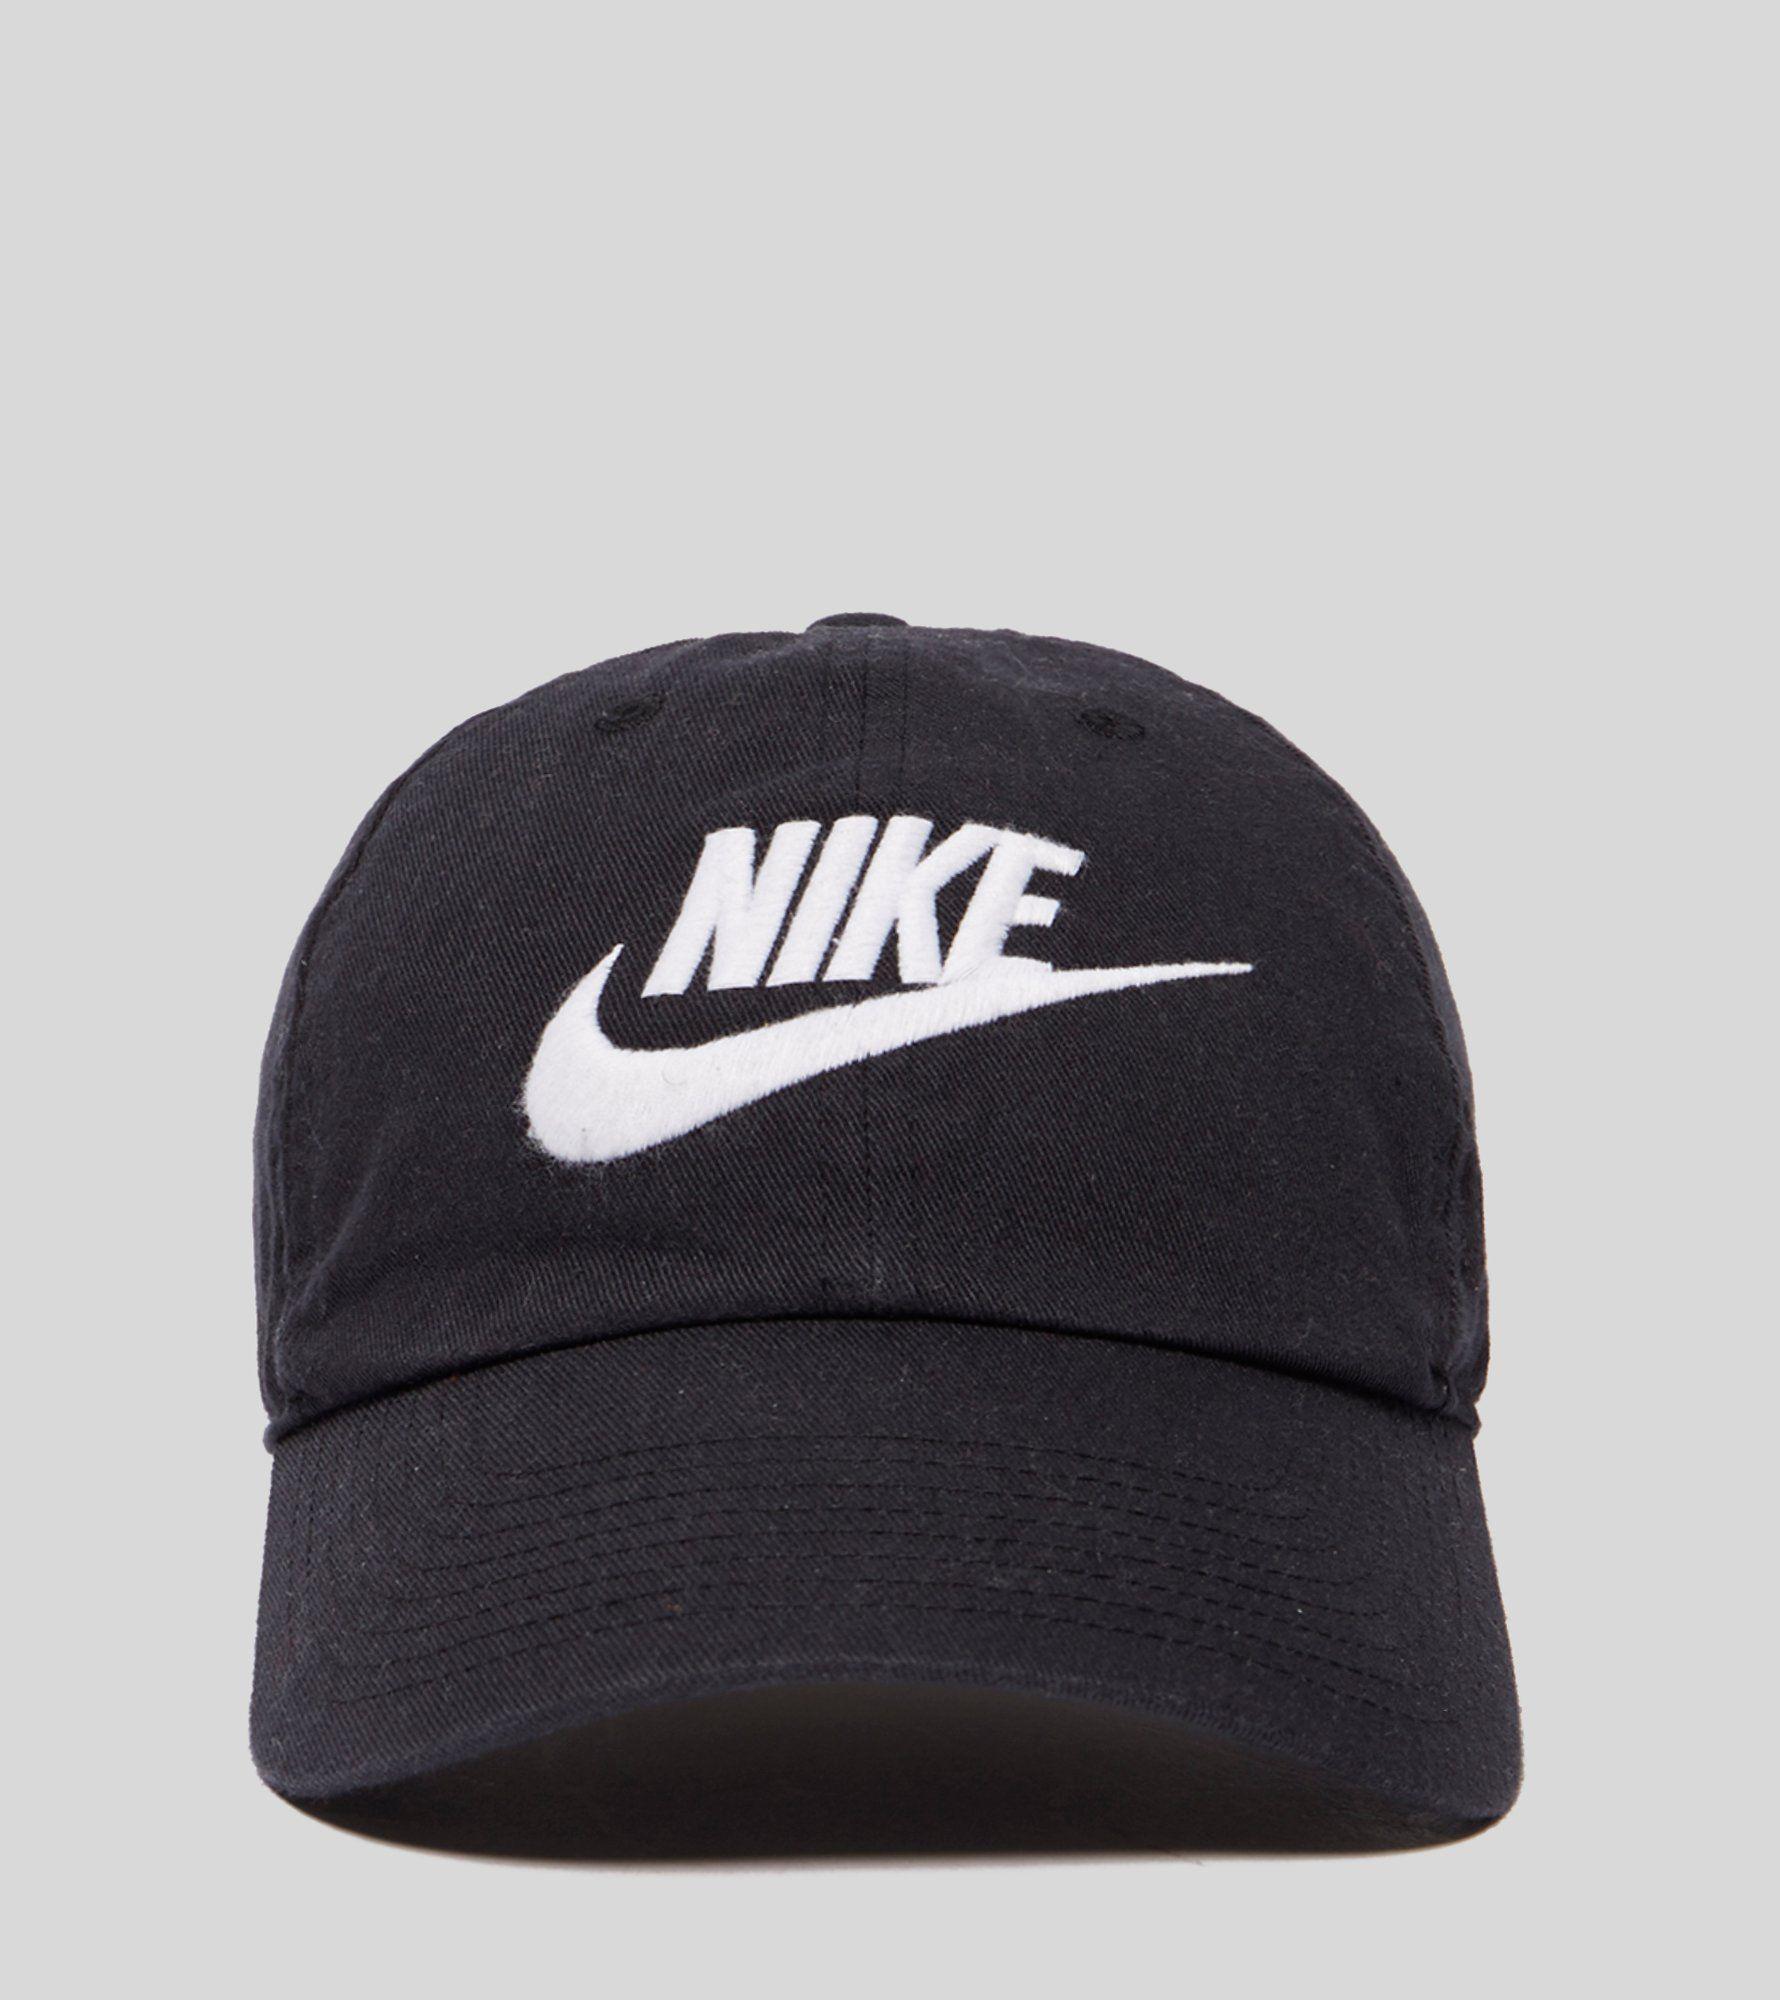 3dde200e83e ... wholesale nike futura washed strapback cap 6ebe7 0d9a9